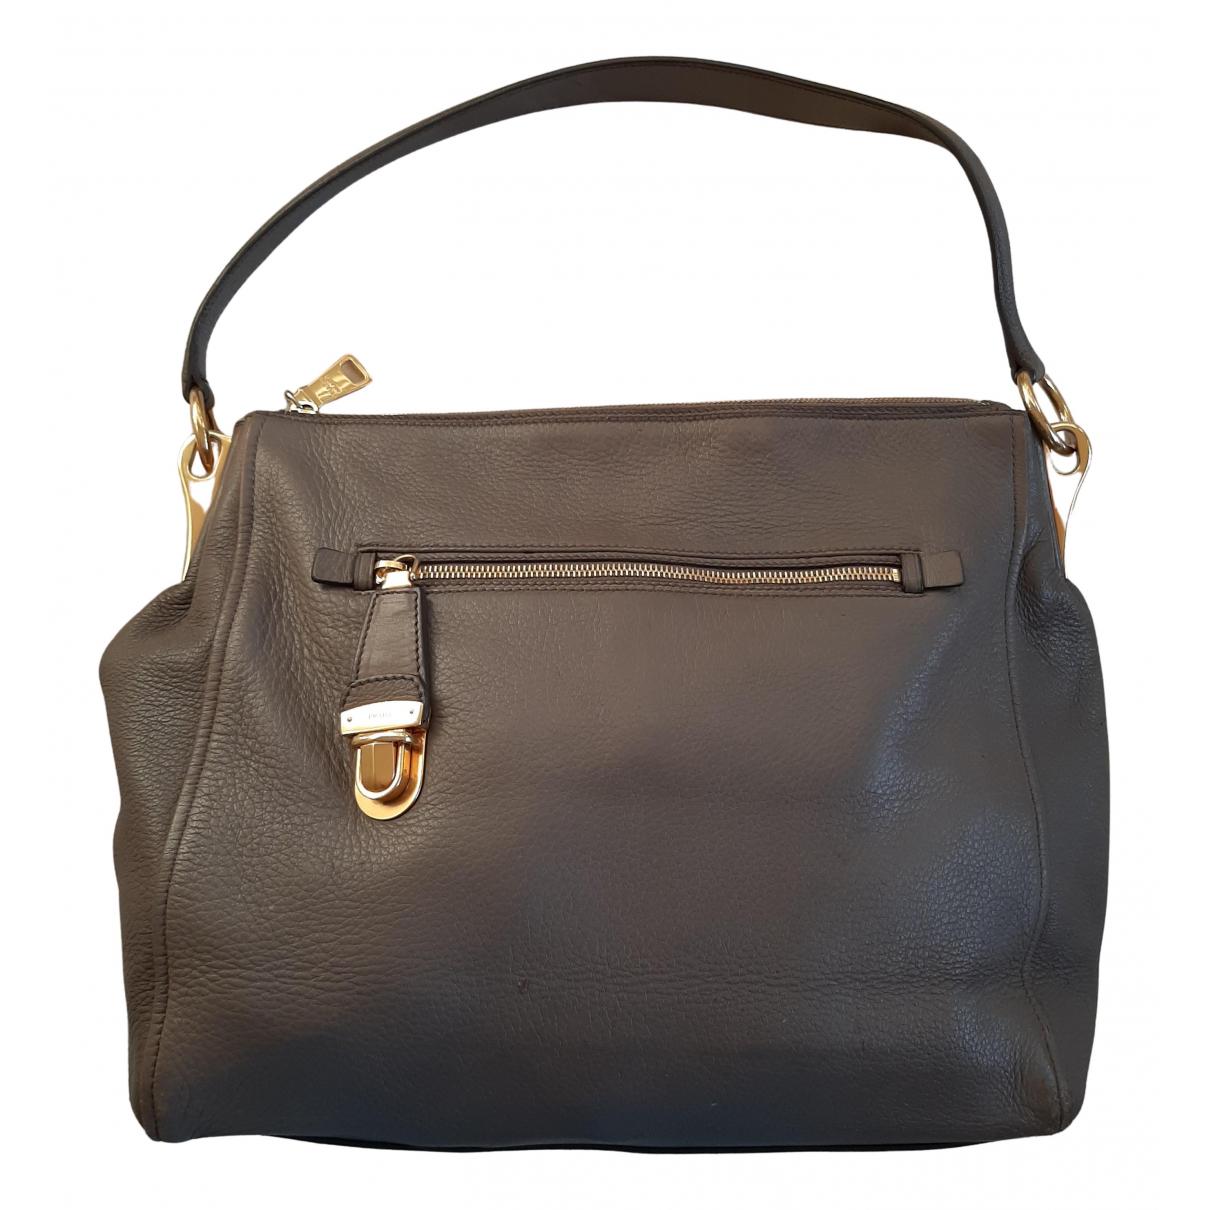 Prada N Khaki Leather handbag for Women N